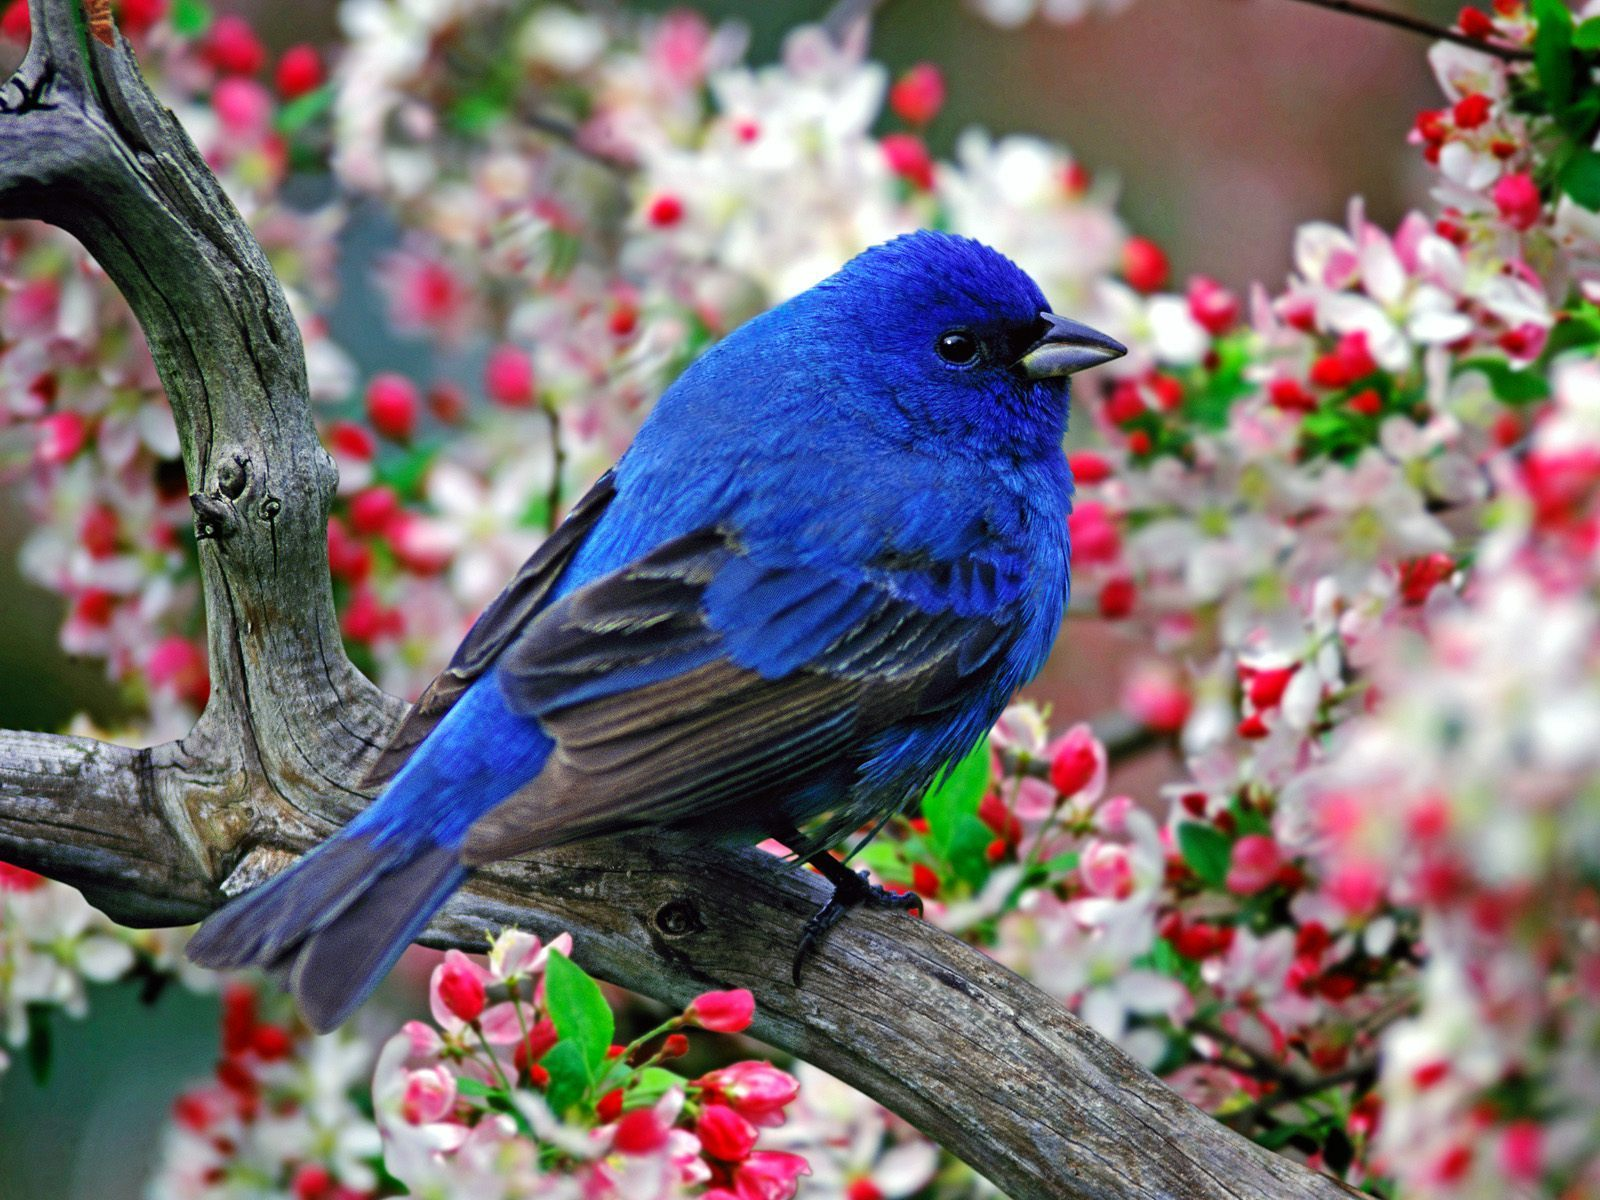 بالصور صور عصافير , اجمل صور عصافير ملونه 5696 4